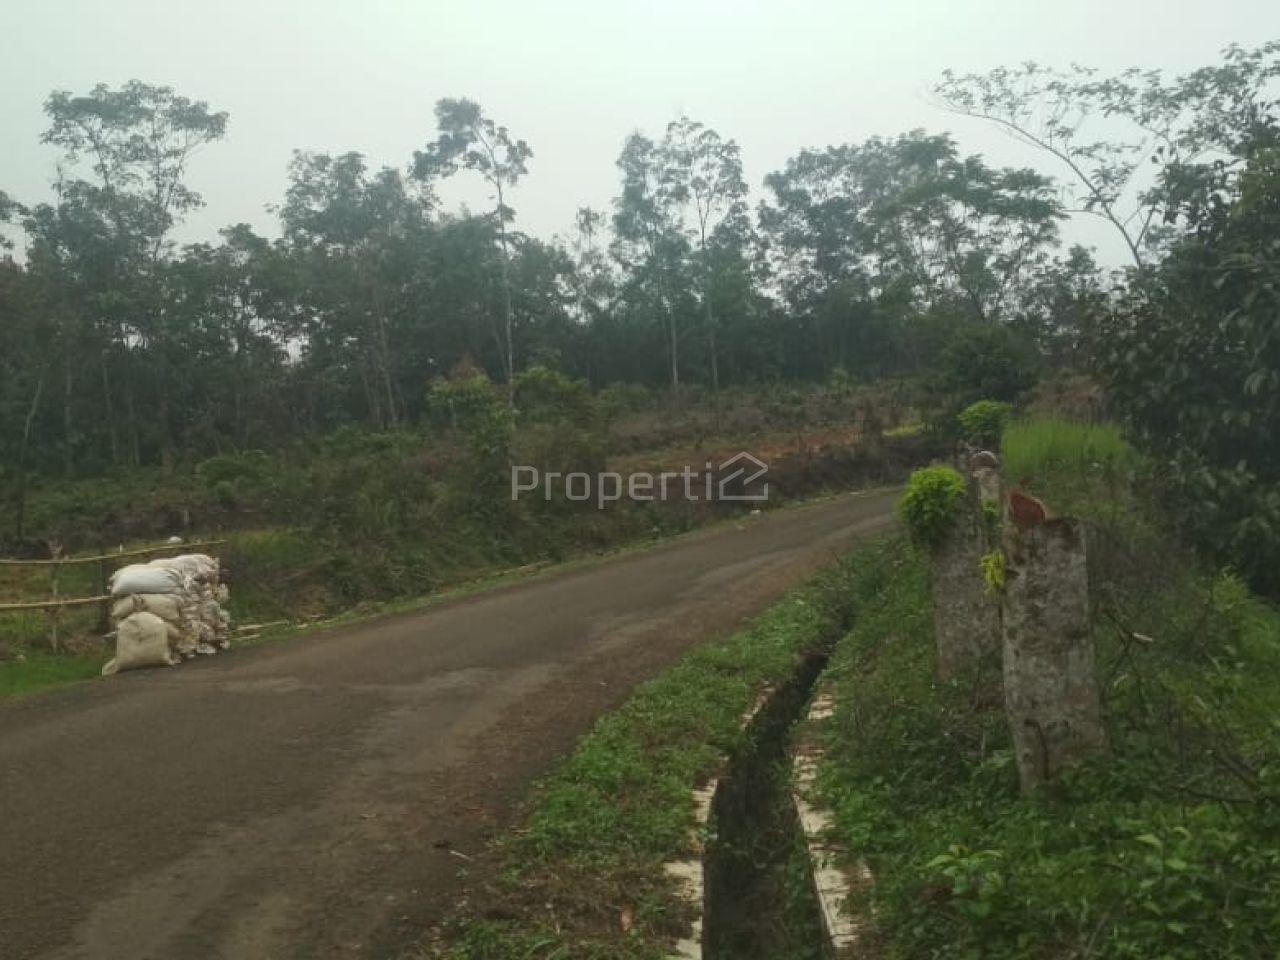 Land Allocation Housing in Cigudeg, Bogor, Jawa Barat